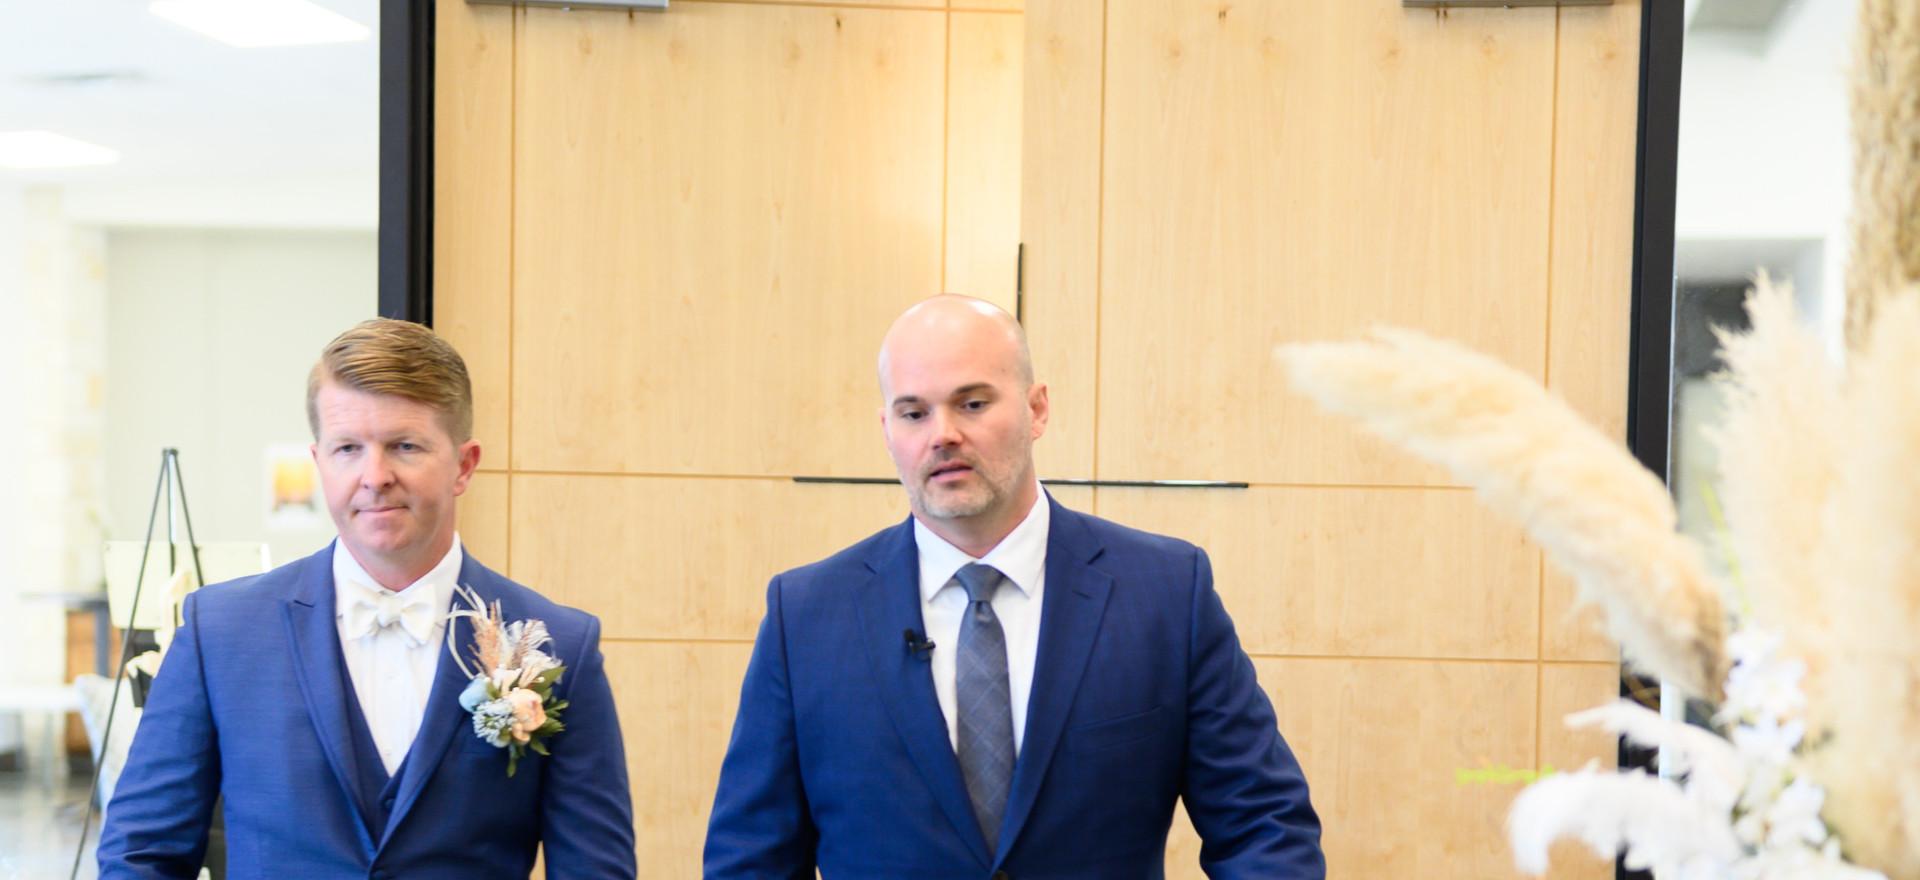 041_Lorena and Mike's Wedding day.jpg